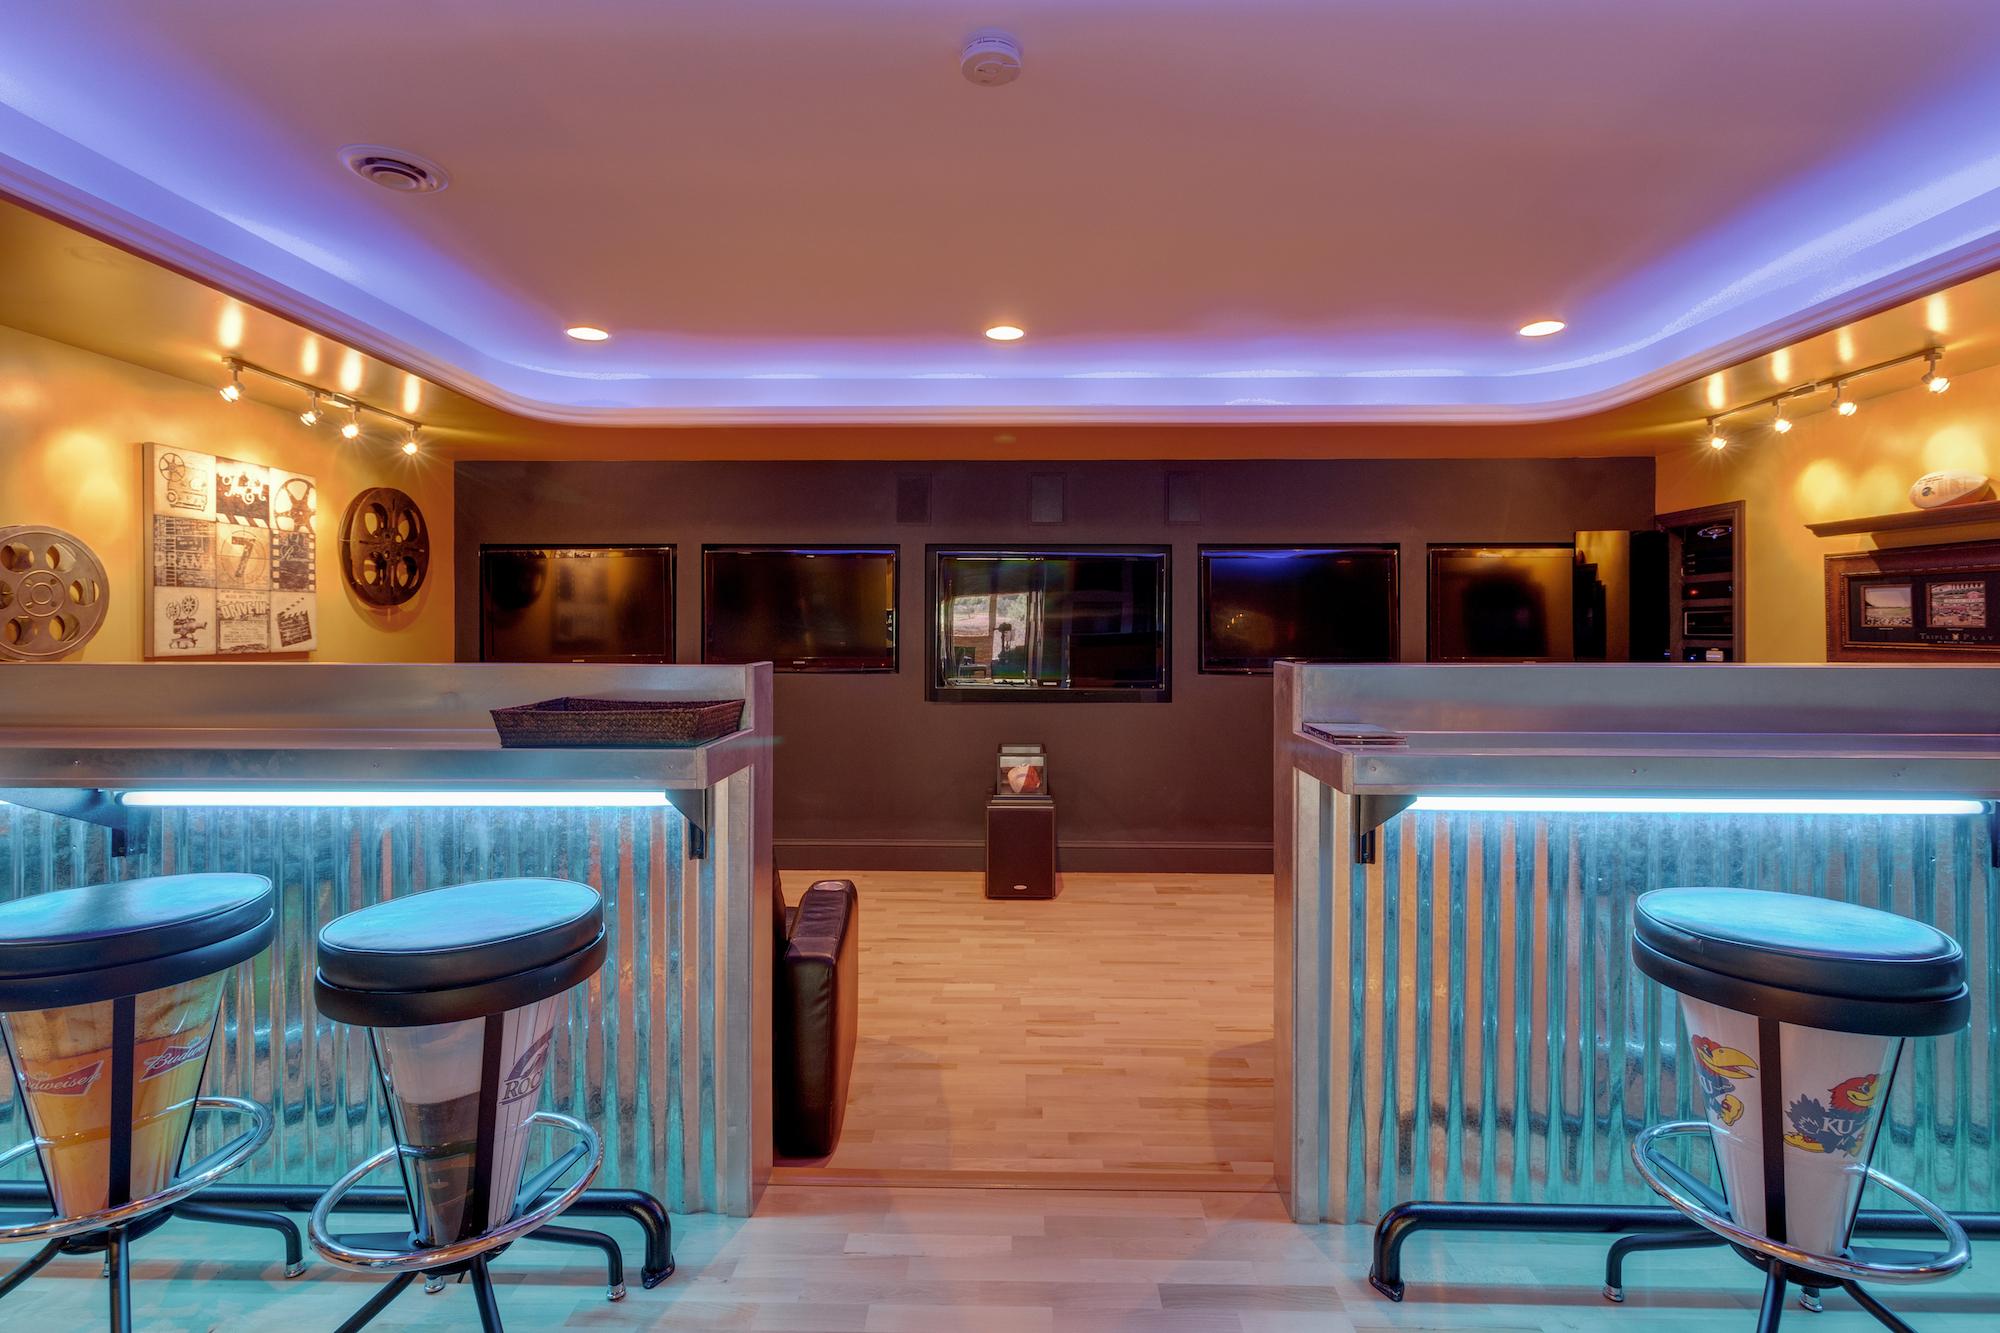 024-Sports bar.jpg